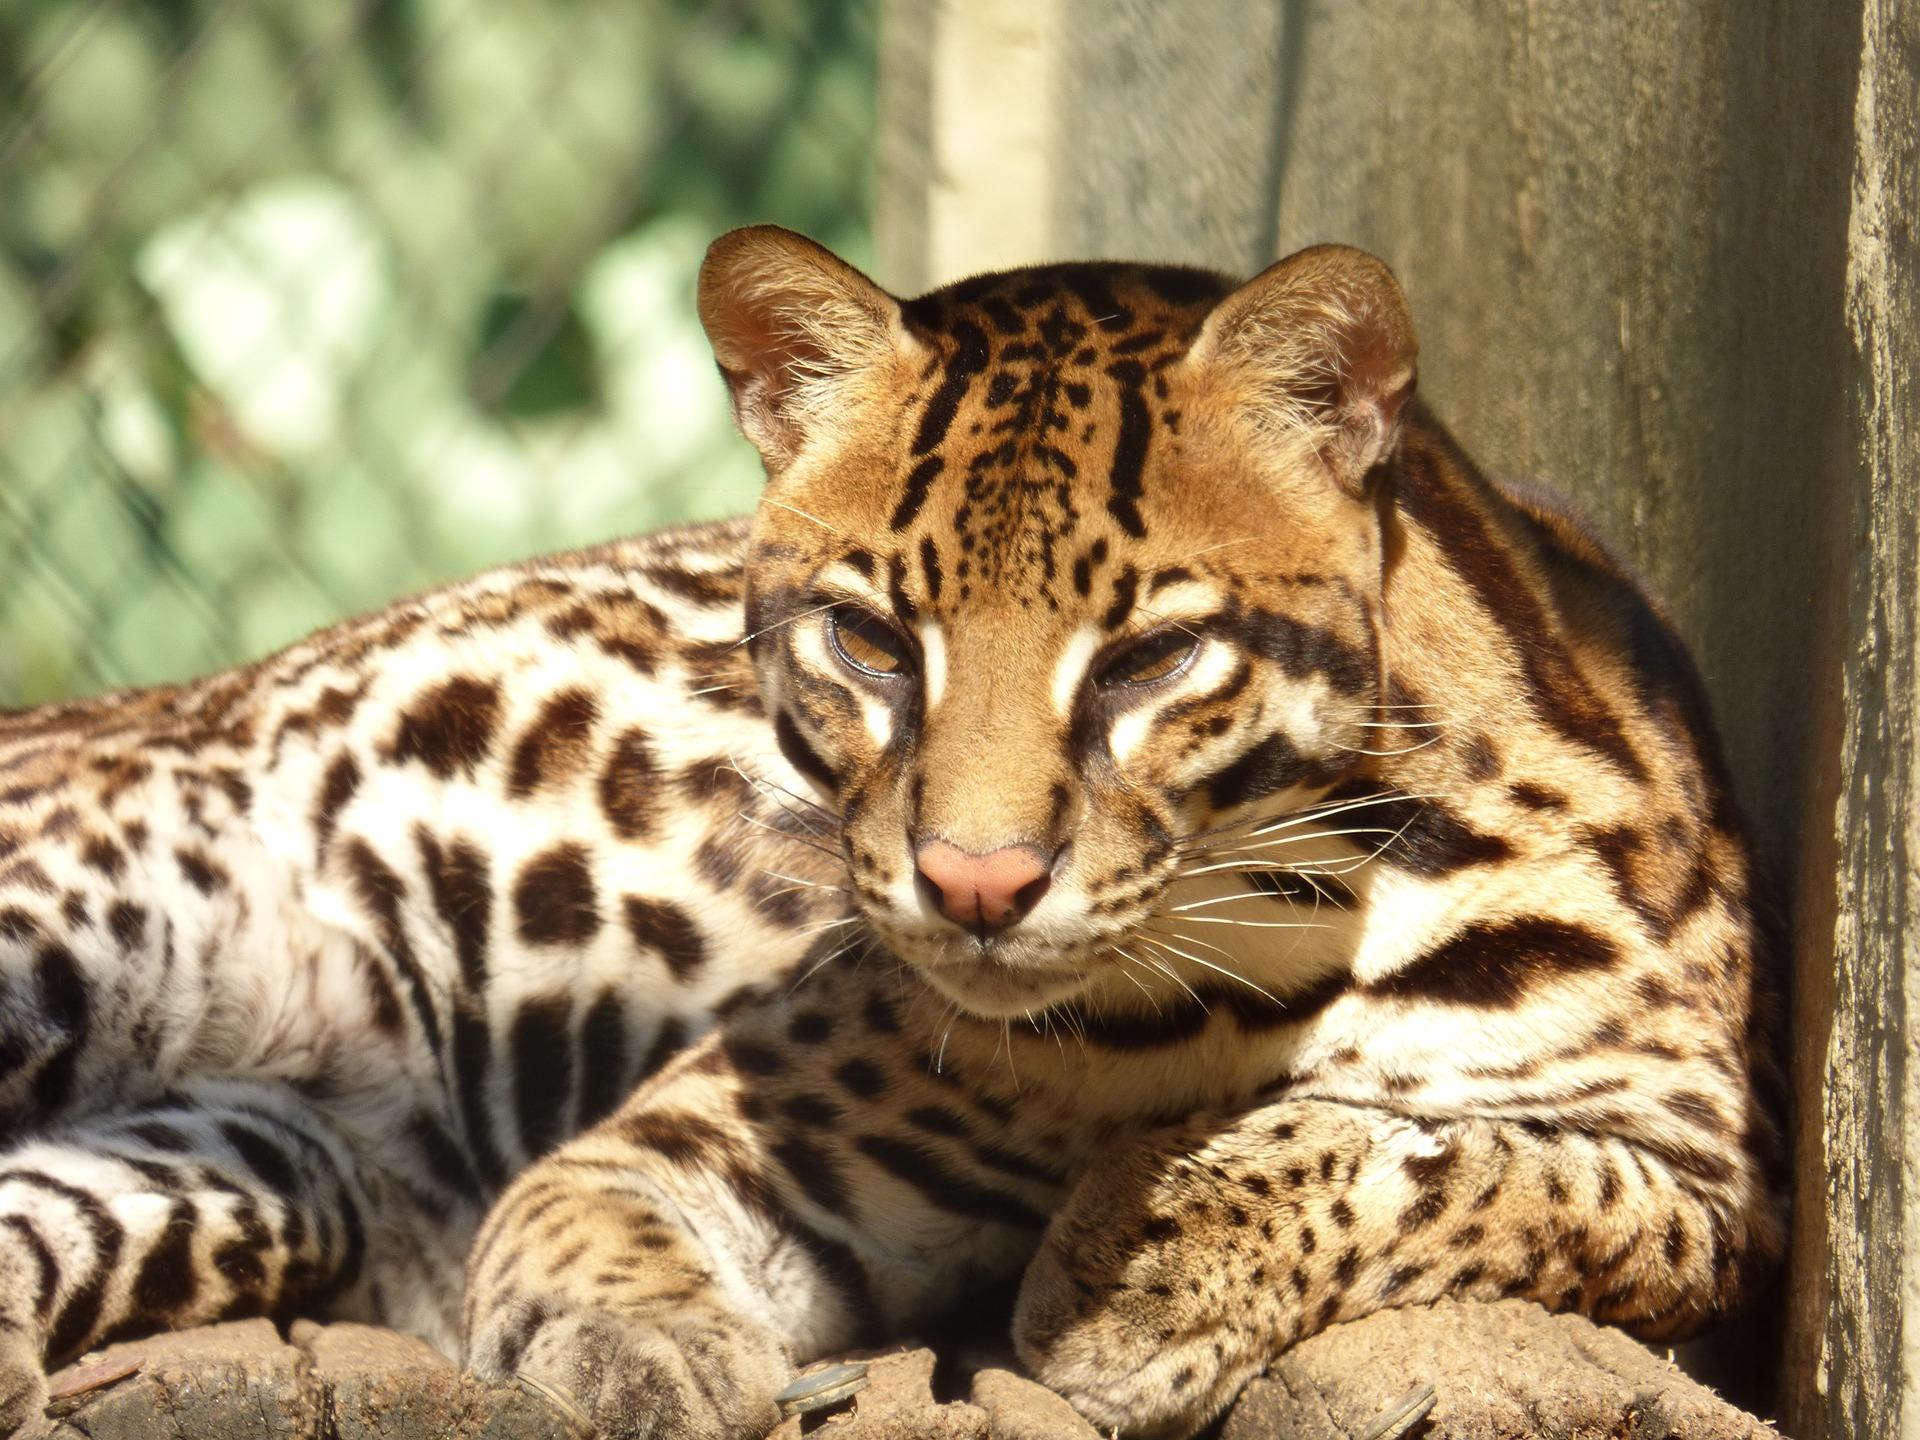 Guatemala wildlife - ocelot